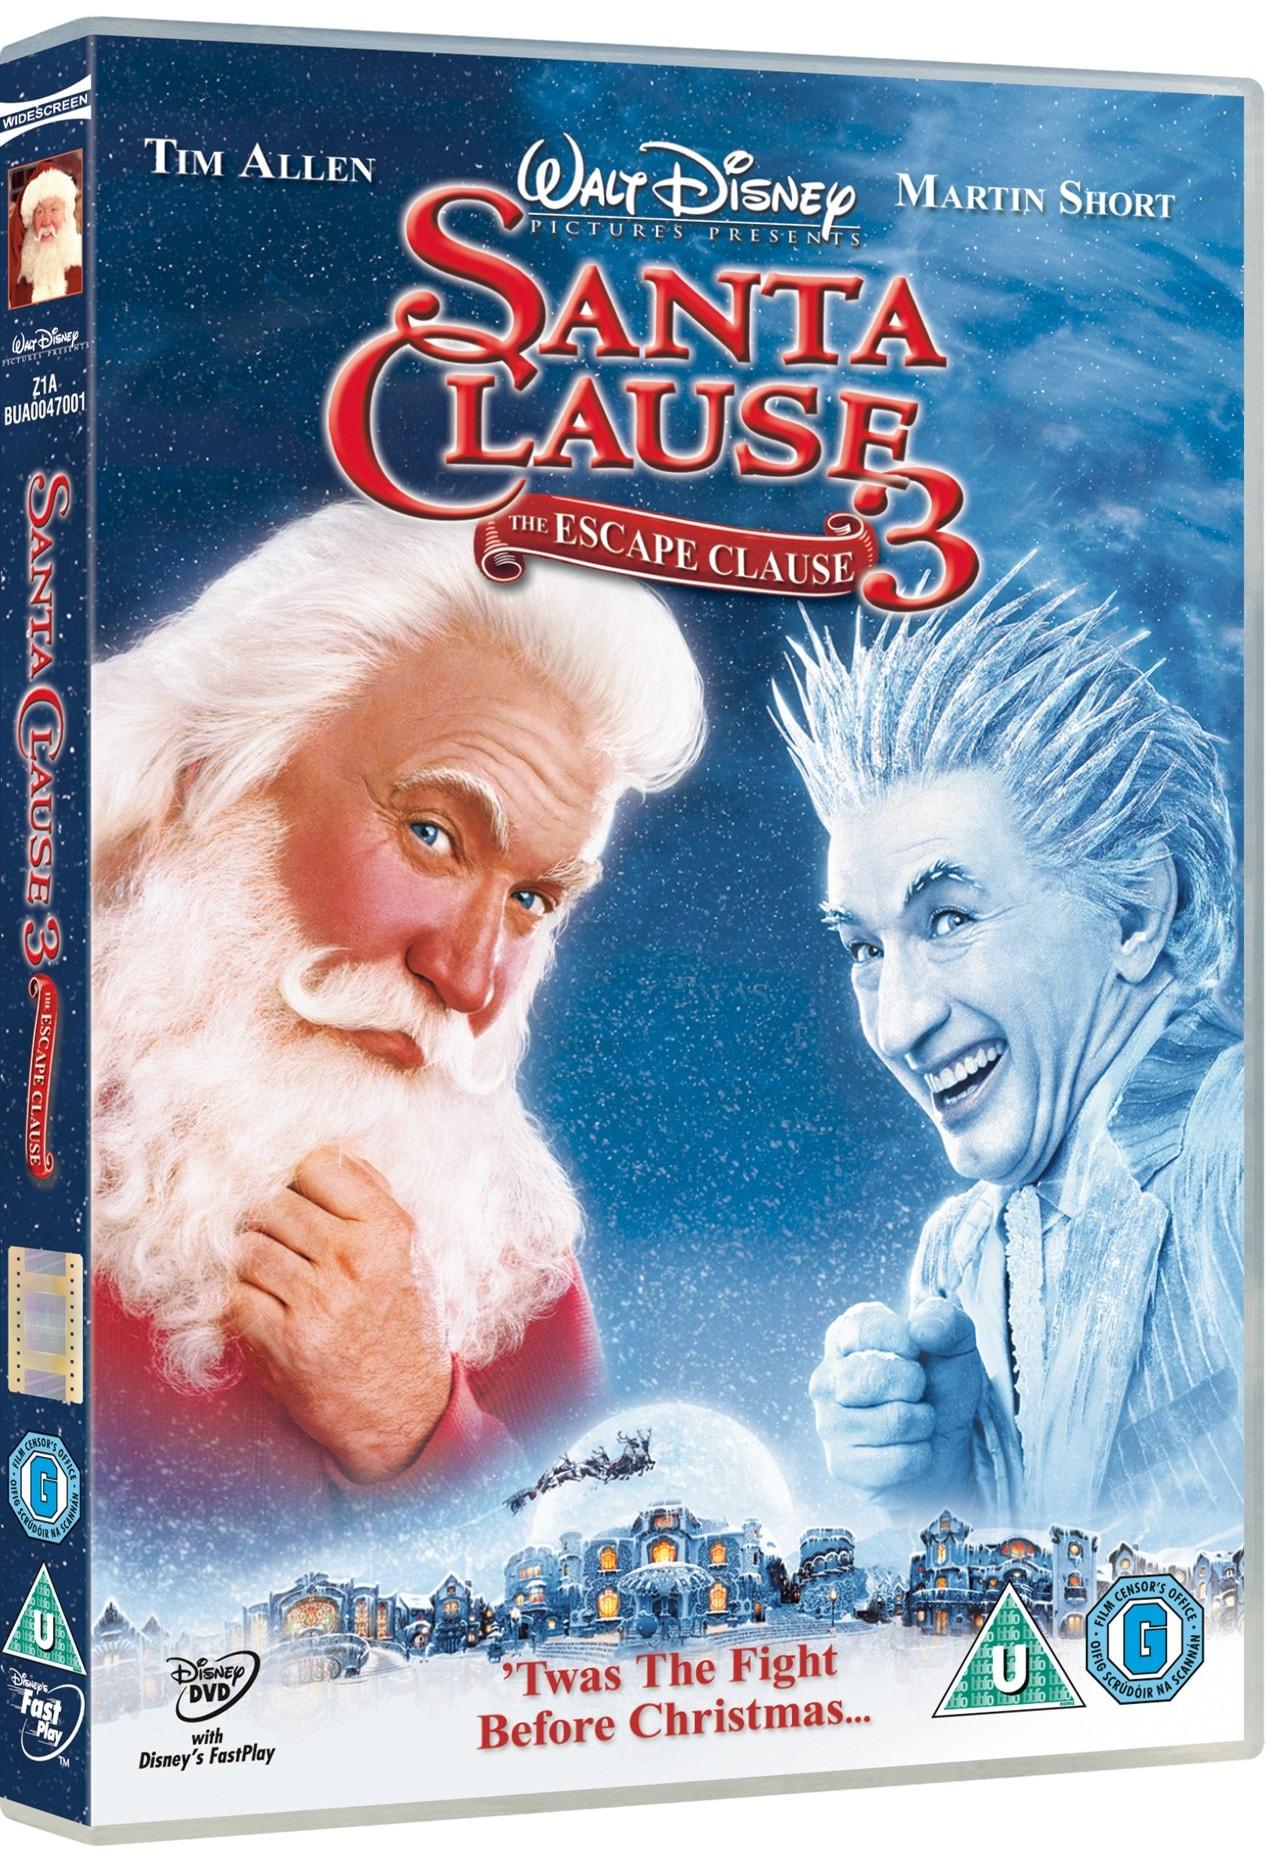 The Santa Clause 3 - The Escape Clause - 2